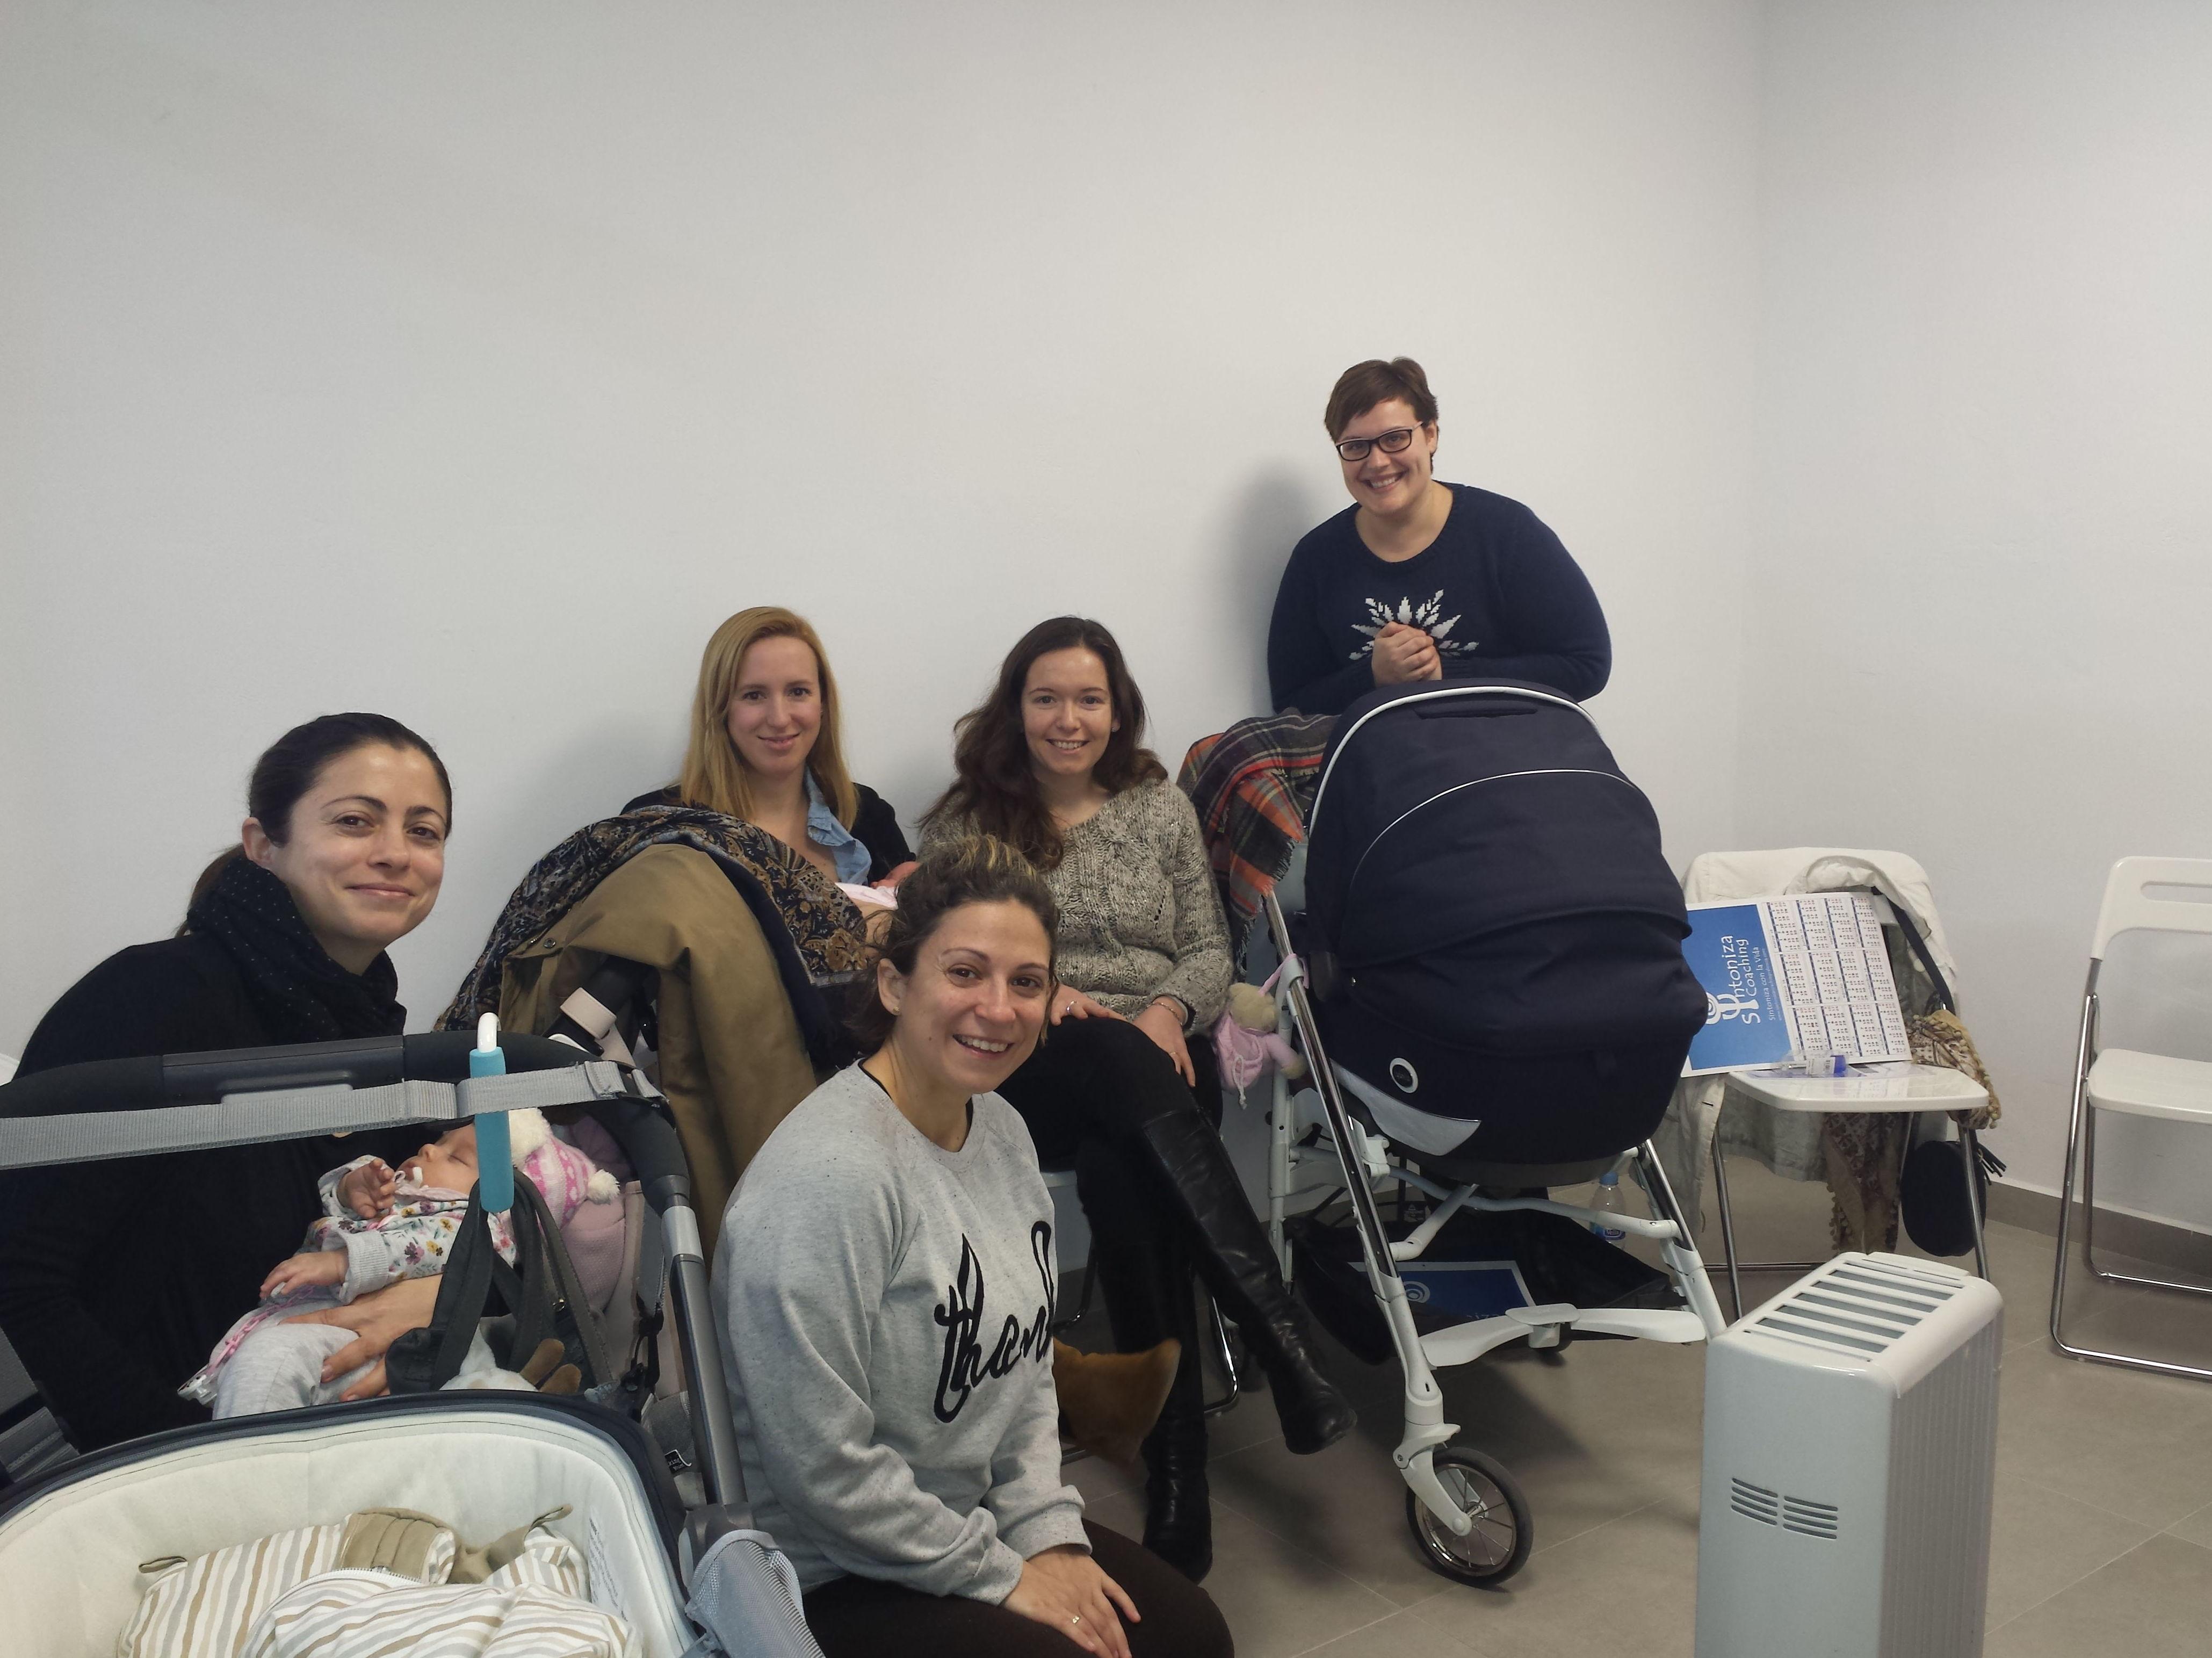 Grupo de madres Charla Cambios emocionales en la maternidad. Farmacia Juan XXIII